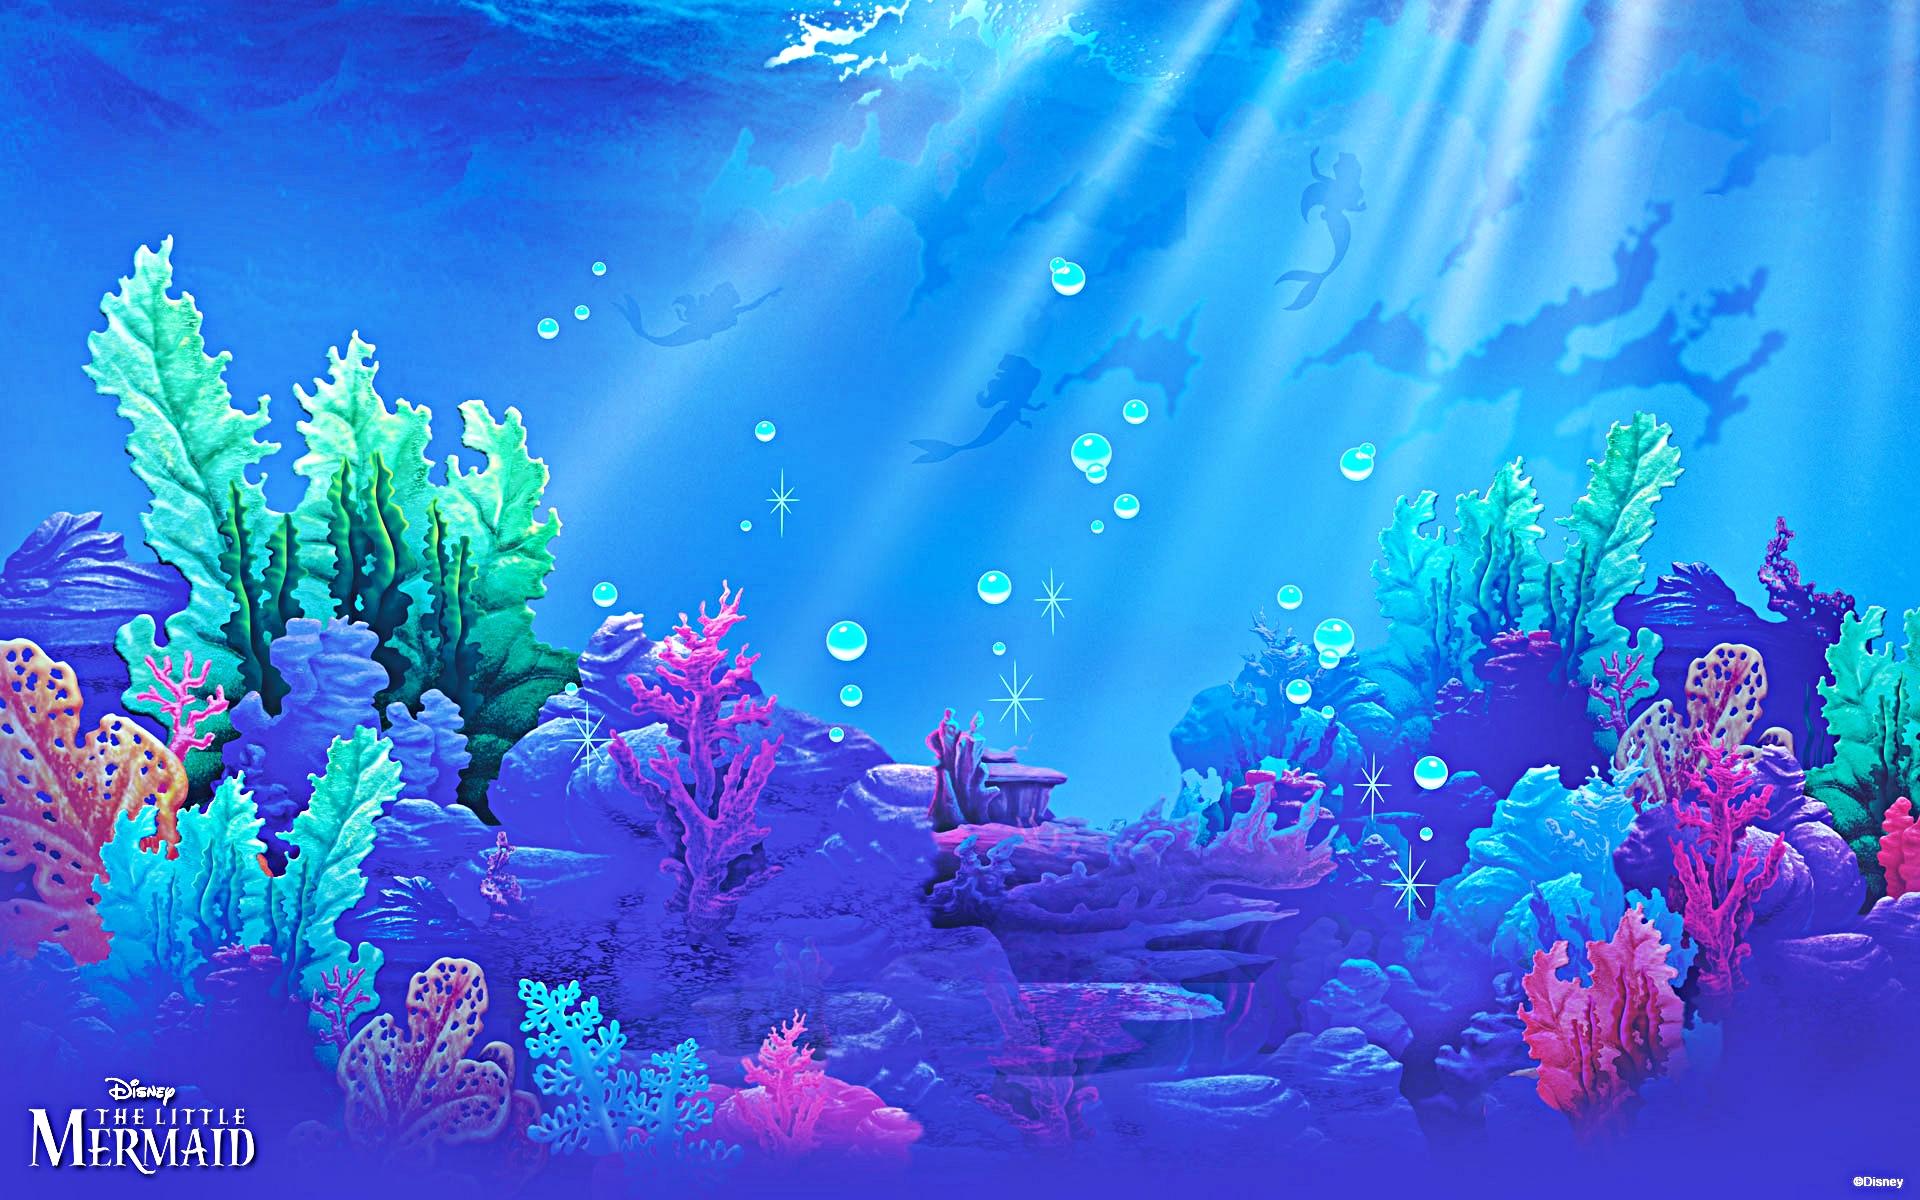 Walt Disney Wallpapers   The Little Mermaid   Walt Disney Characters 1920x1200